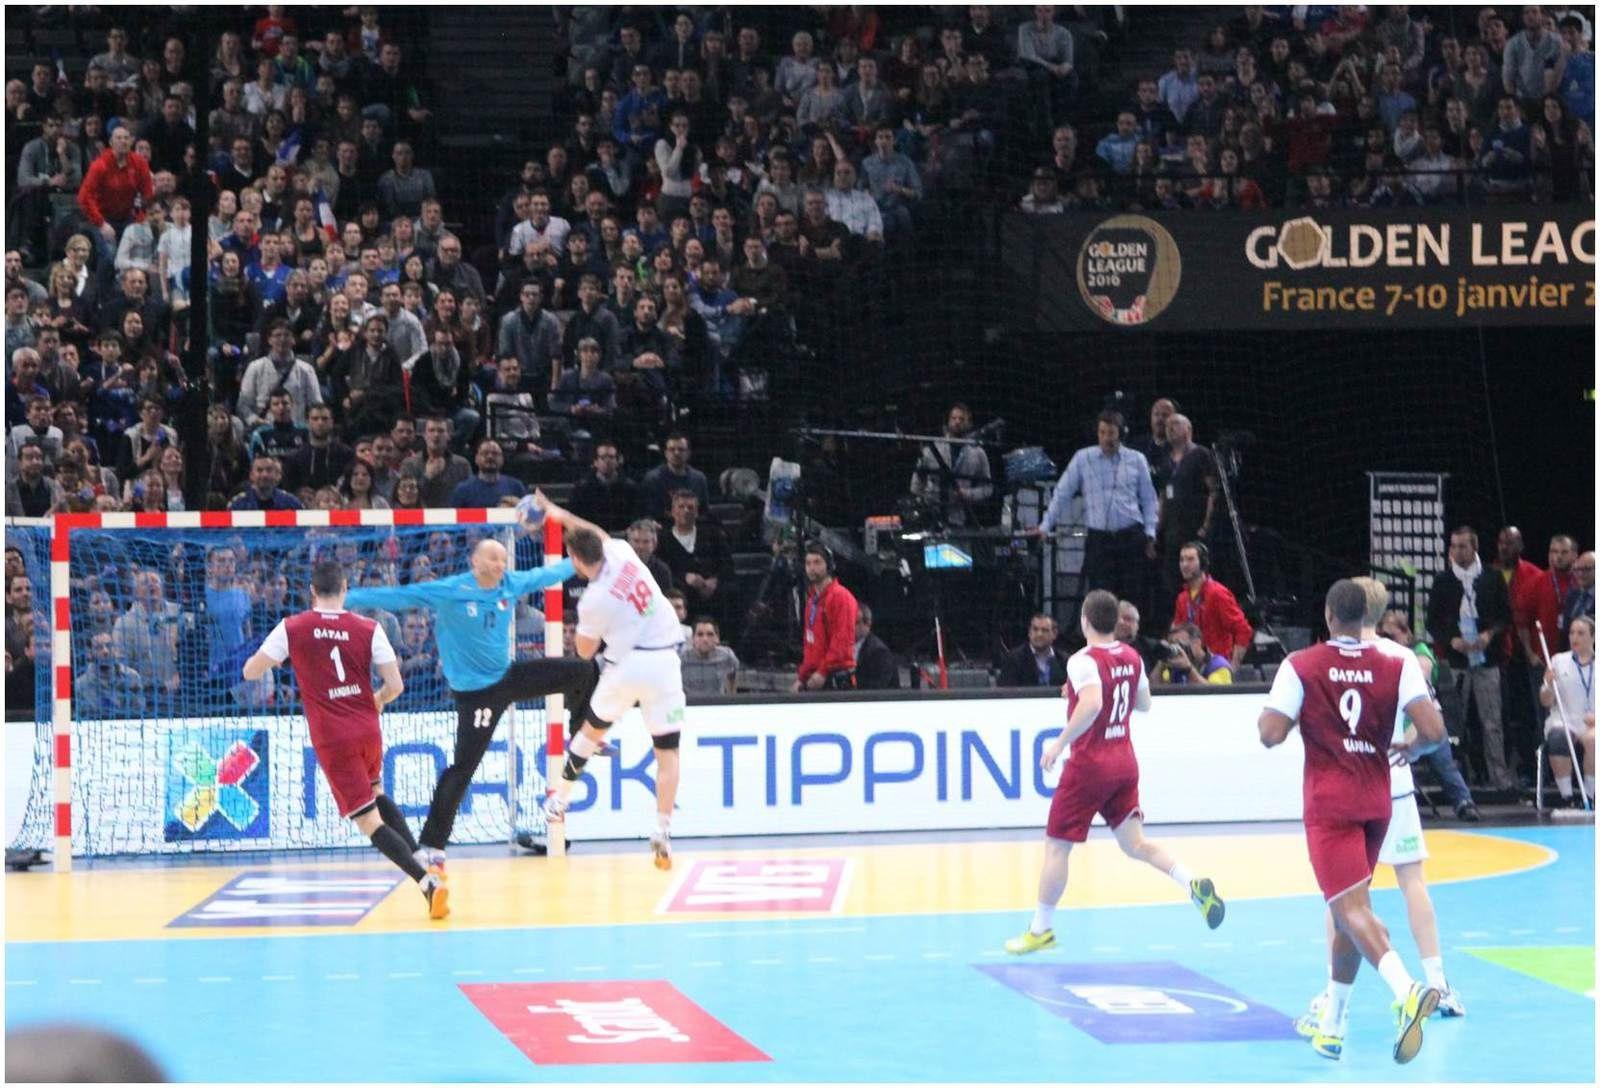 Golden League 2016 (AccorHôtelsArena - 10.01.2016) 1/2